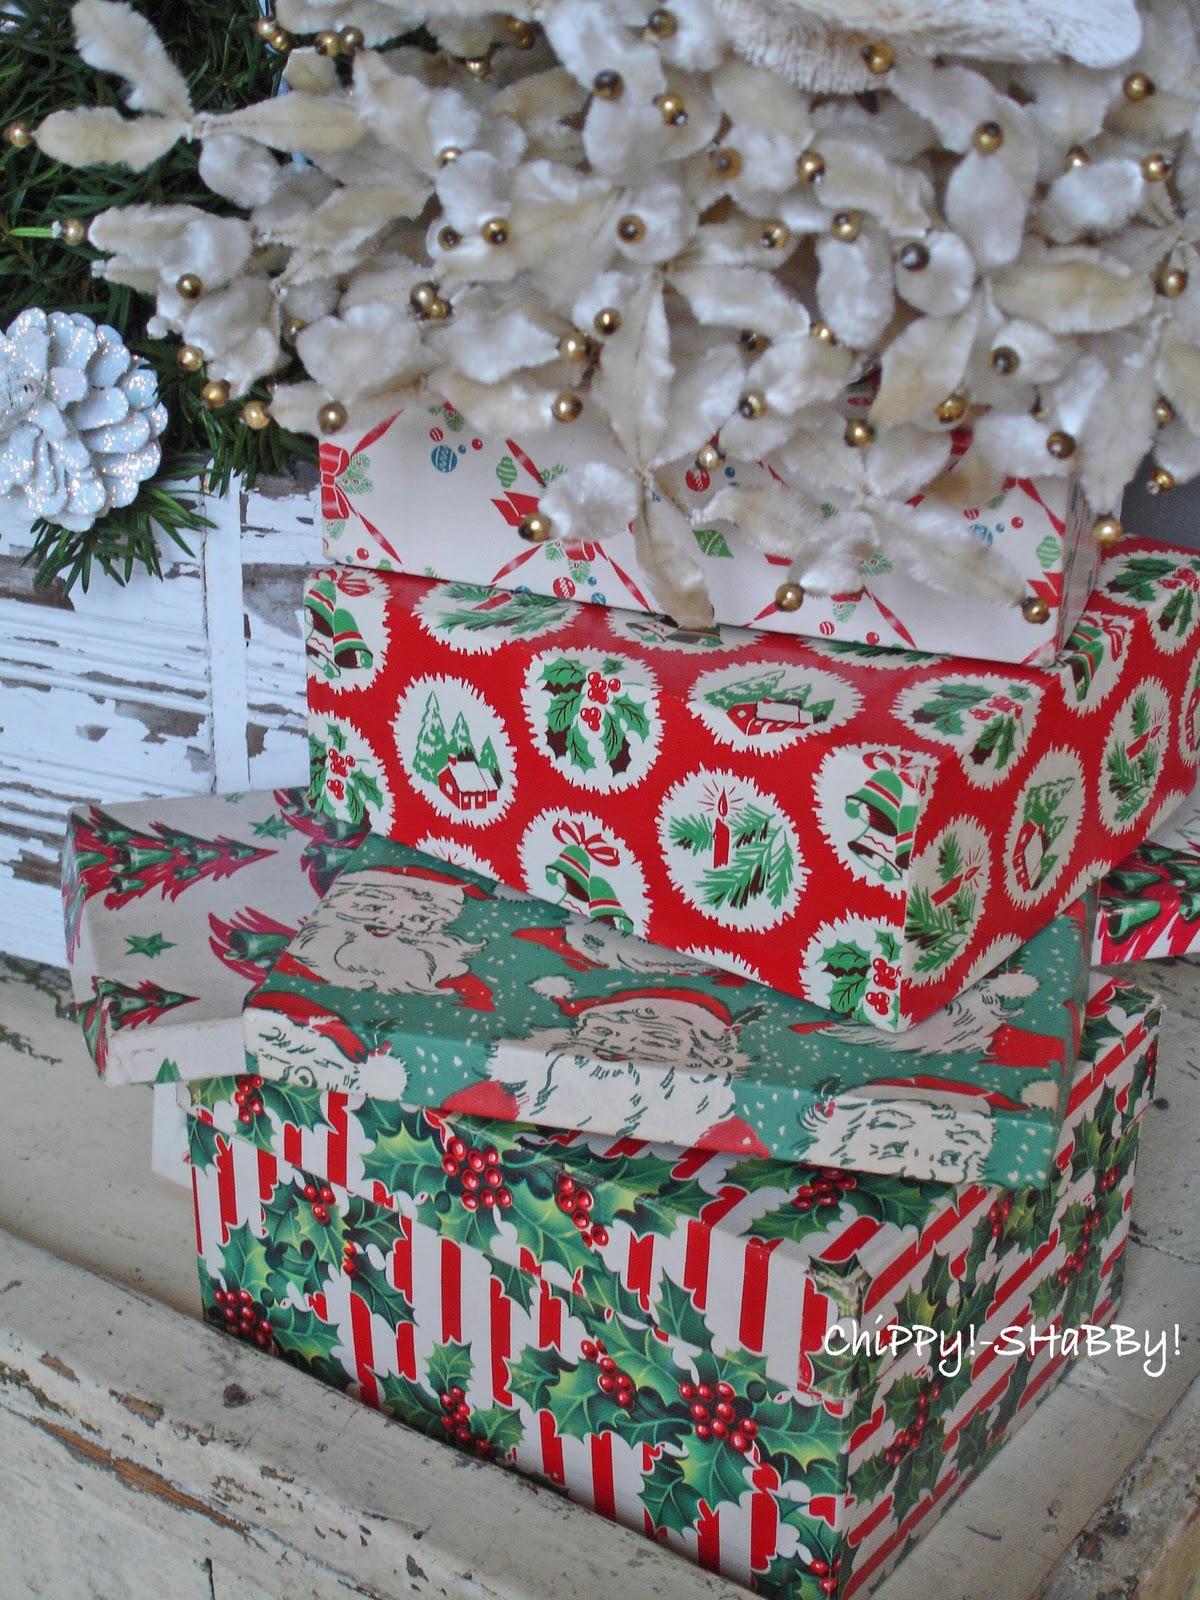 http://2.bp.blogspot.com/-Us_gX5Cba1c/TutblPYMf5I/AAAAAAAAFWo/en3Ghv6aiys/s1600/boxes-chenille+tree.jpg